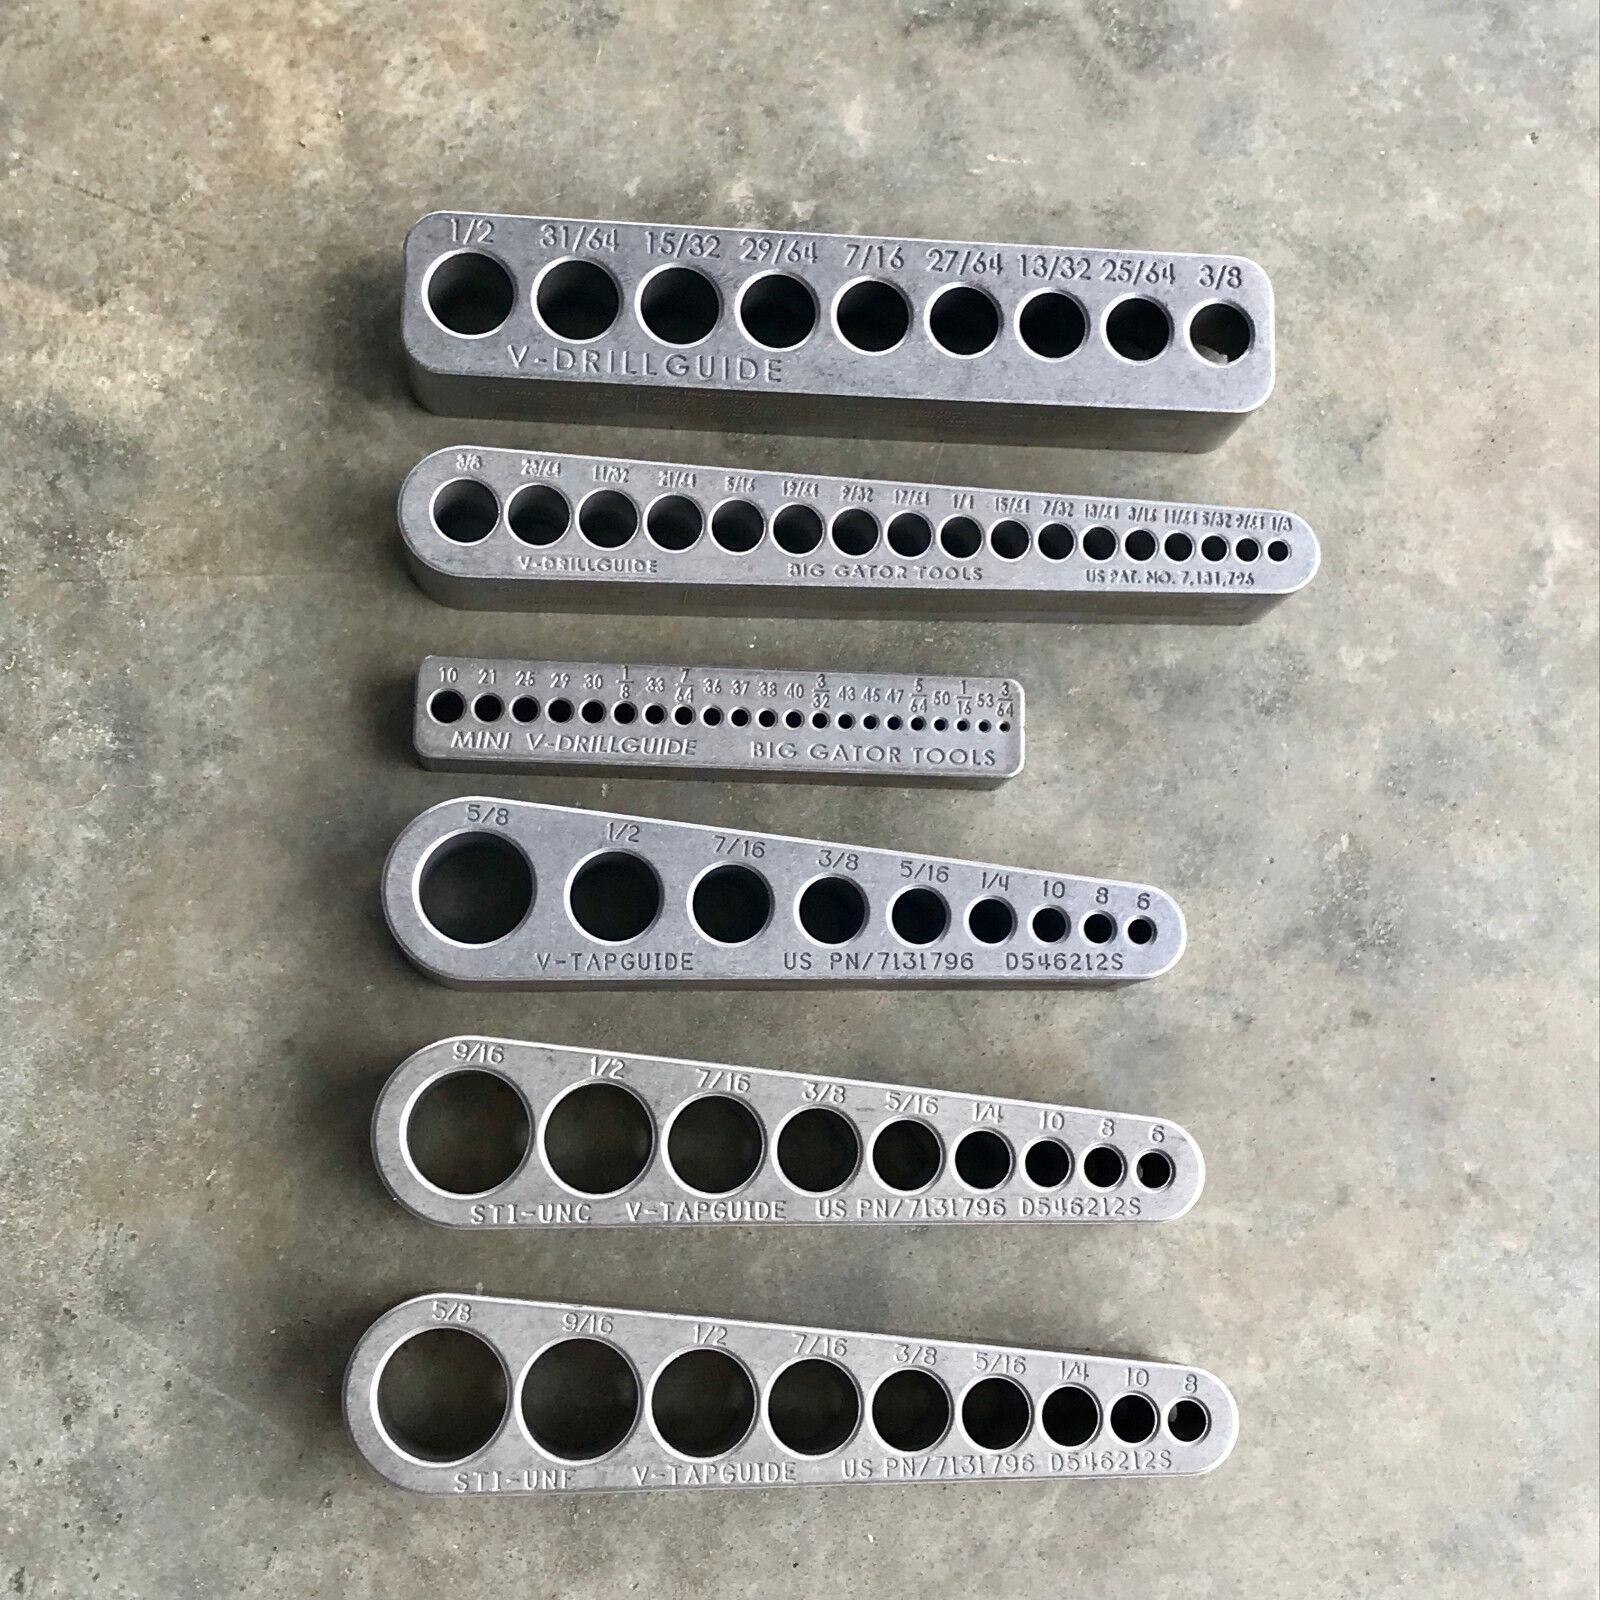 Big Gator Tools - STANDARDSET - The Complete Standard Set - 6 Piece Tool Set